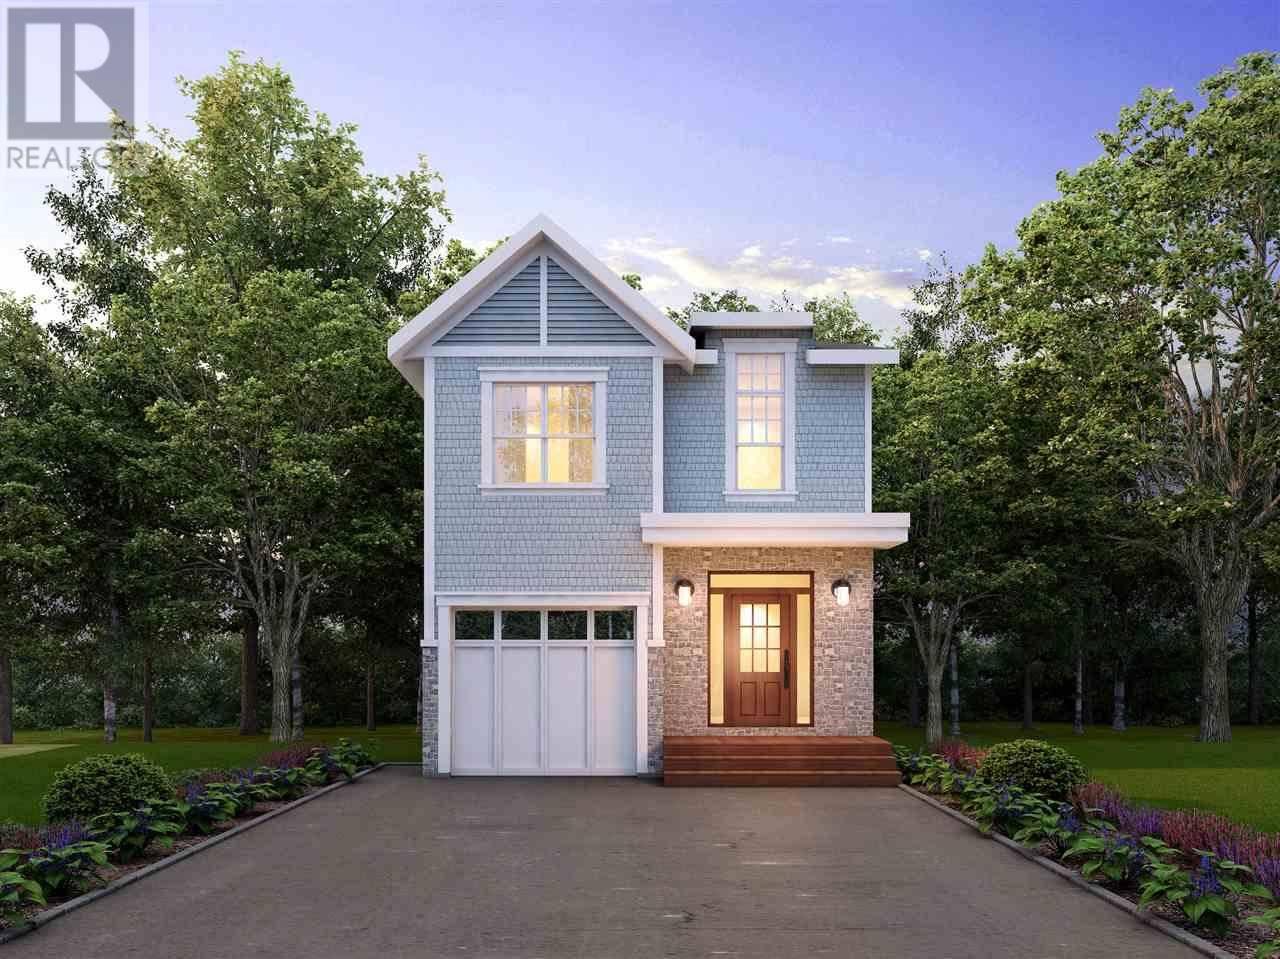 House for sale at 37 Darjeeling Dr Unit 420 Halifax Nova Scotia - MLS: 201917351